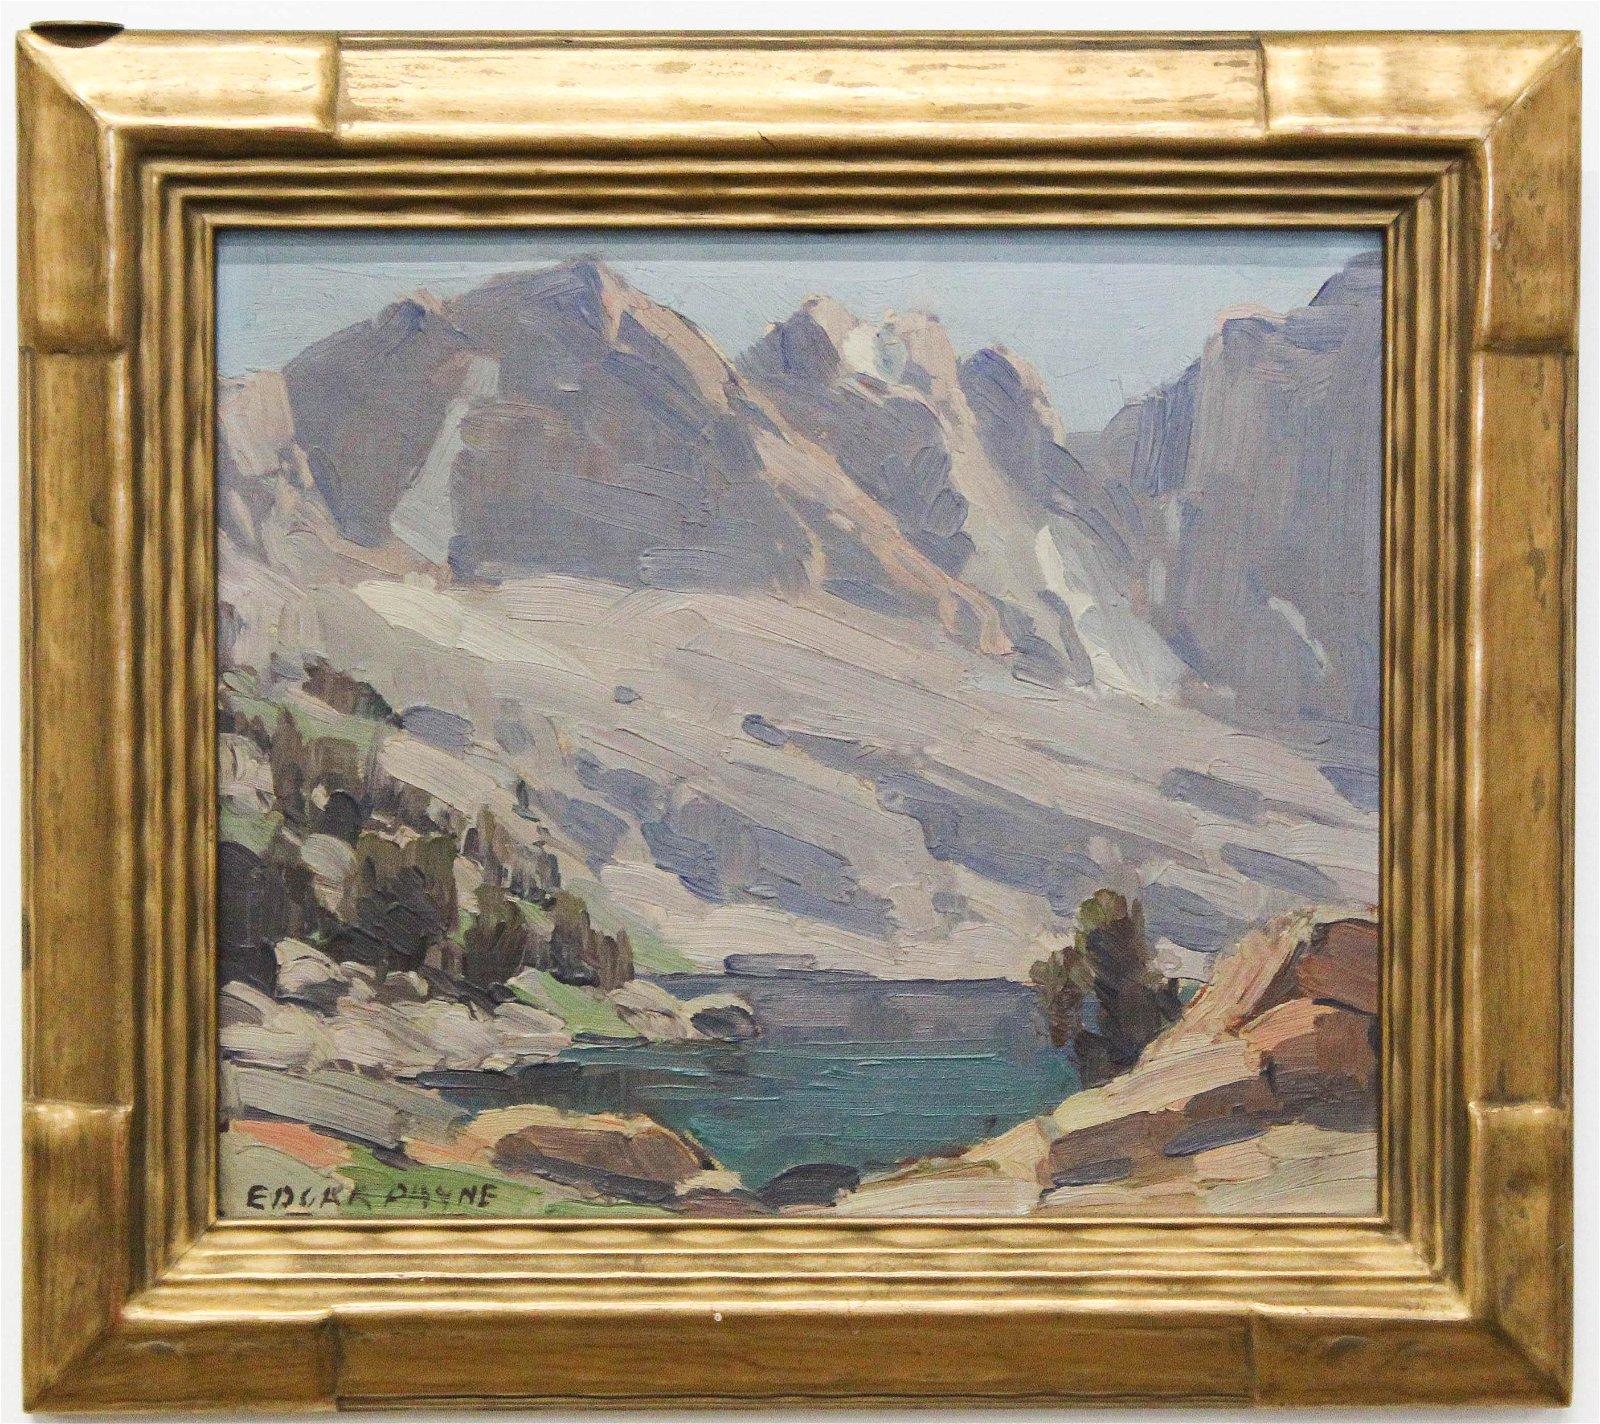 Edgar Alwin Payne (1883-1947) Sierra Nevada Mountains